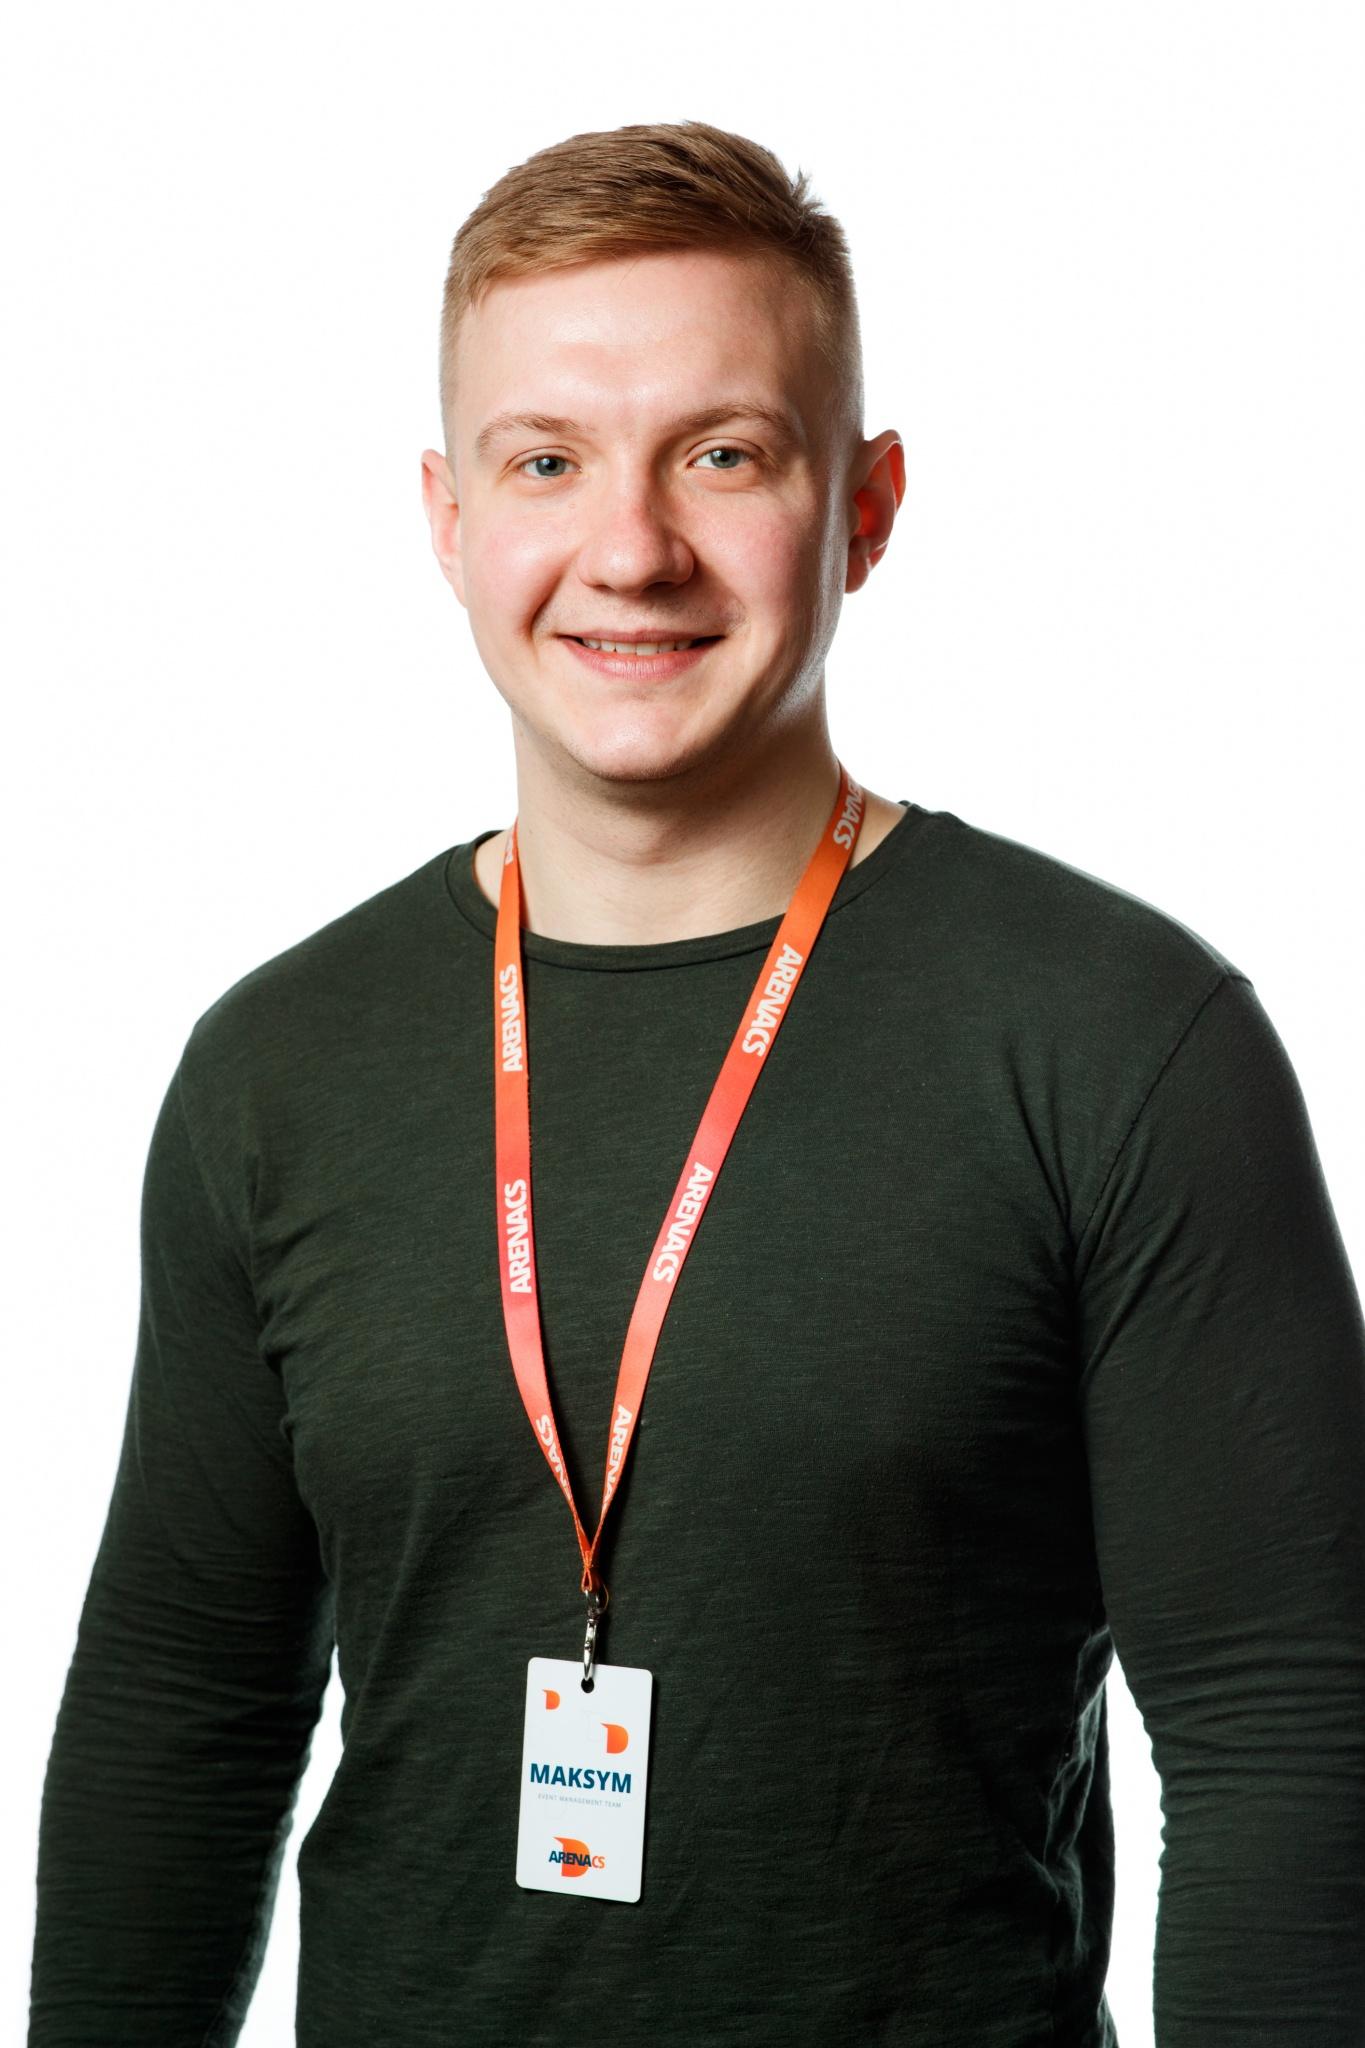 Maksym Denin